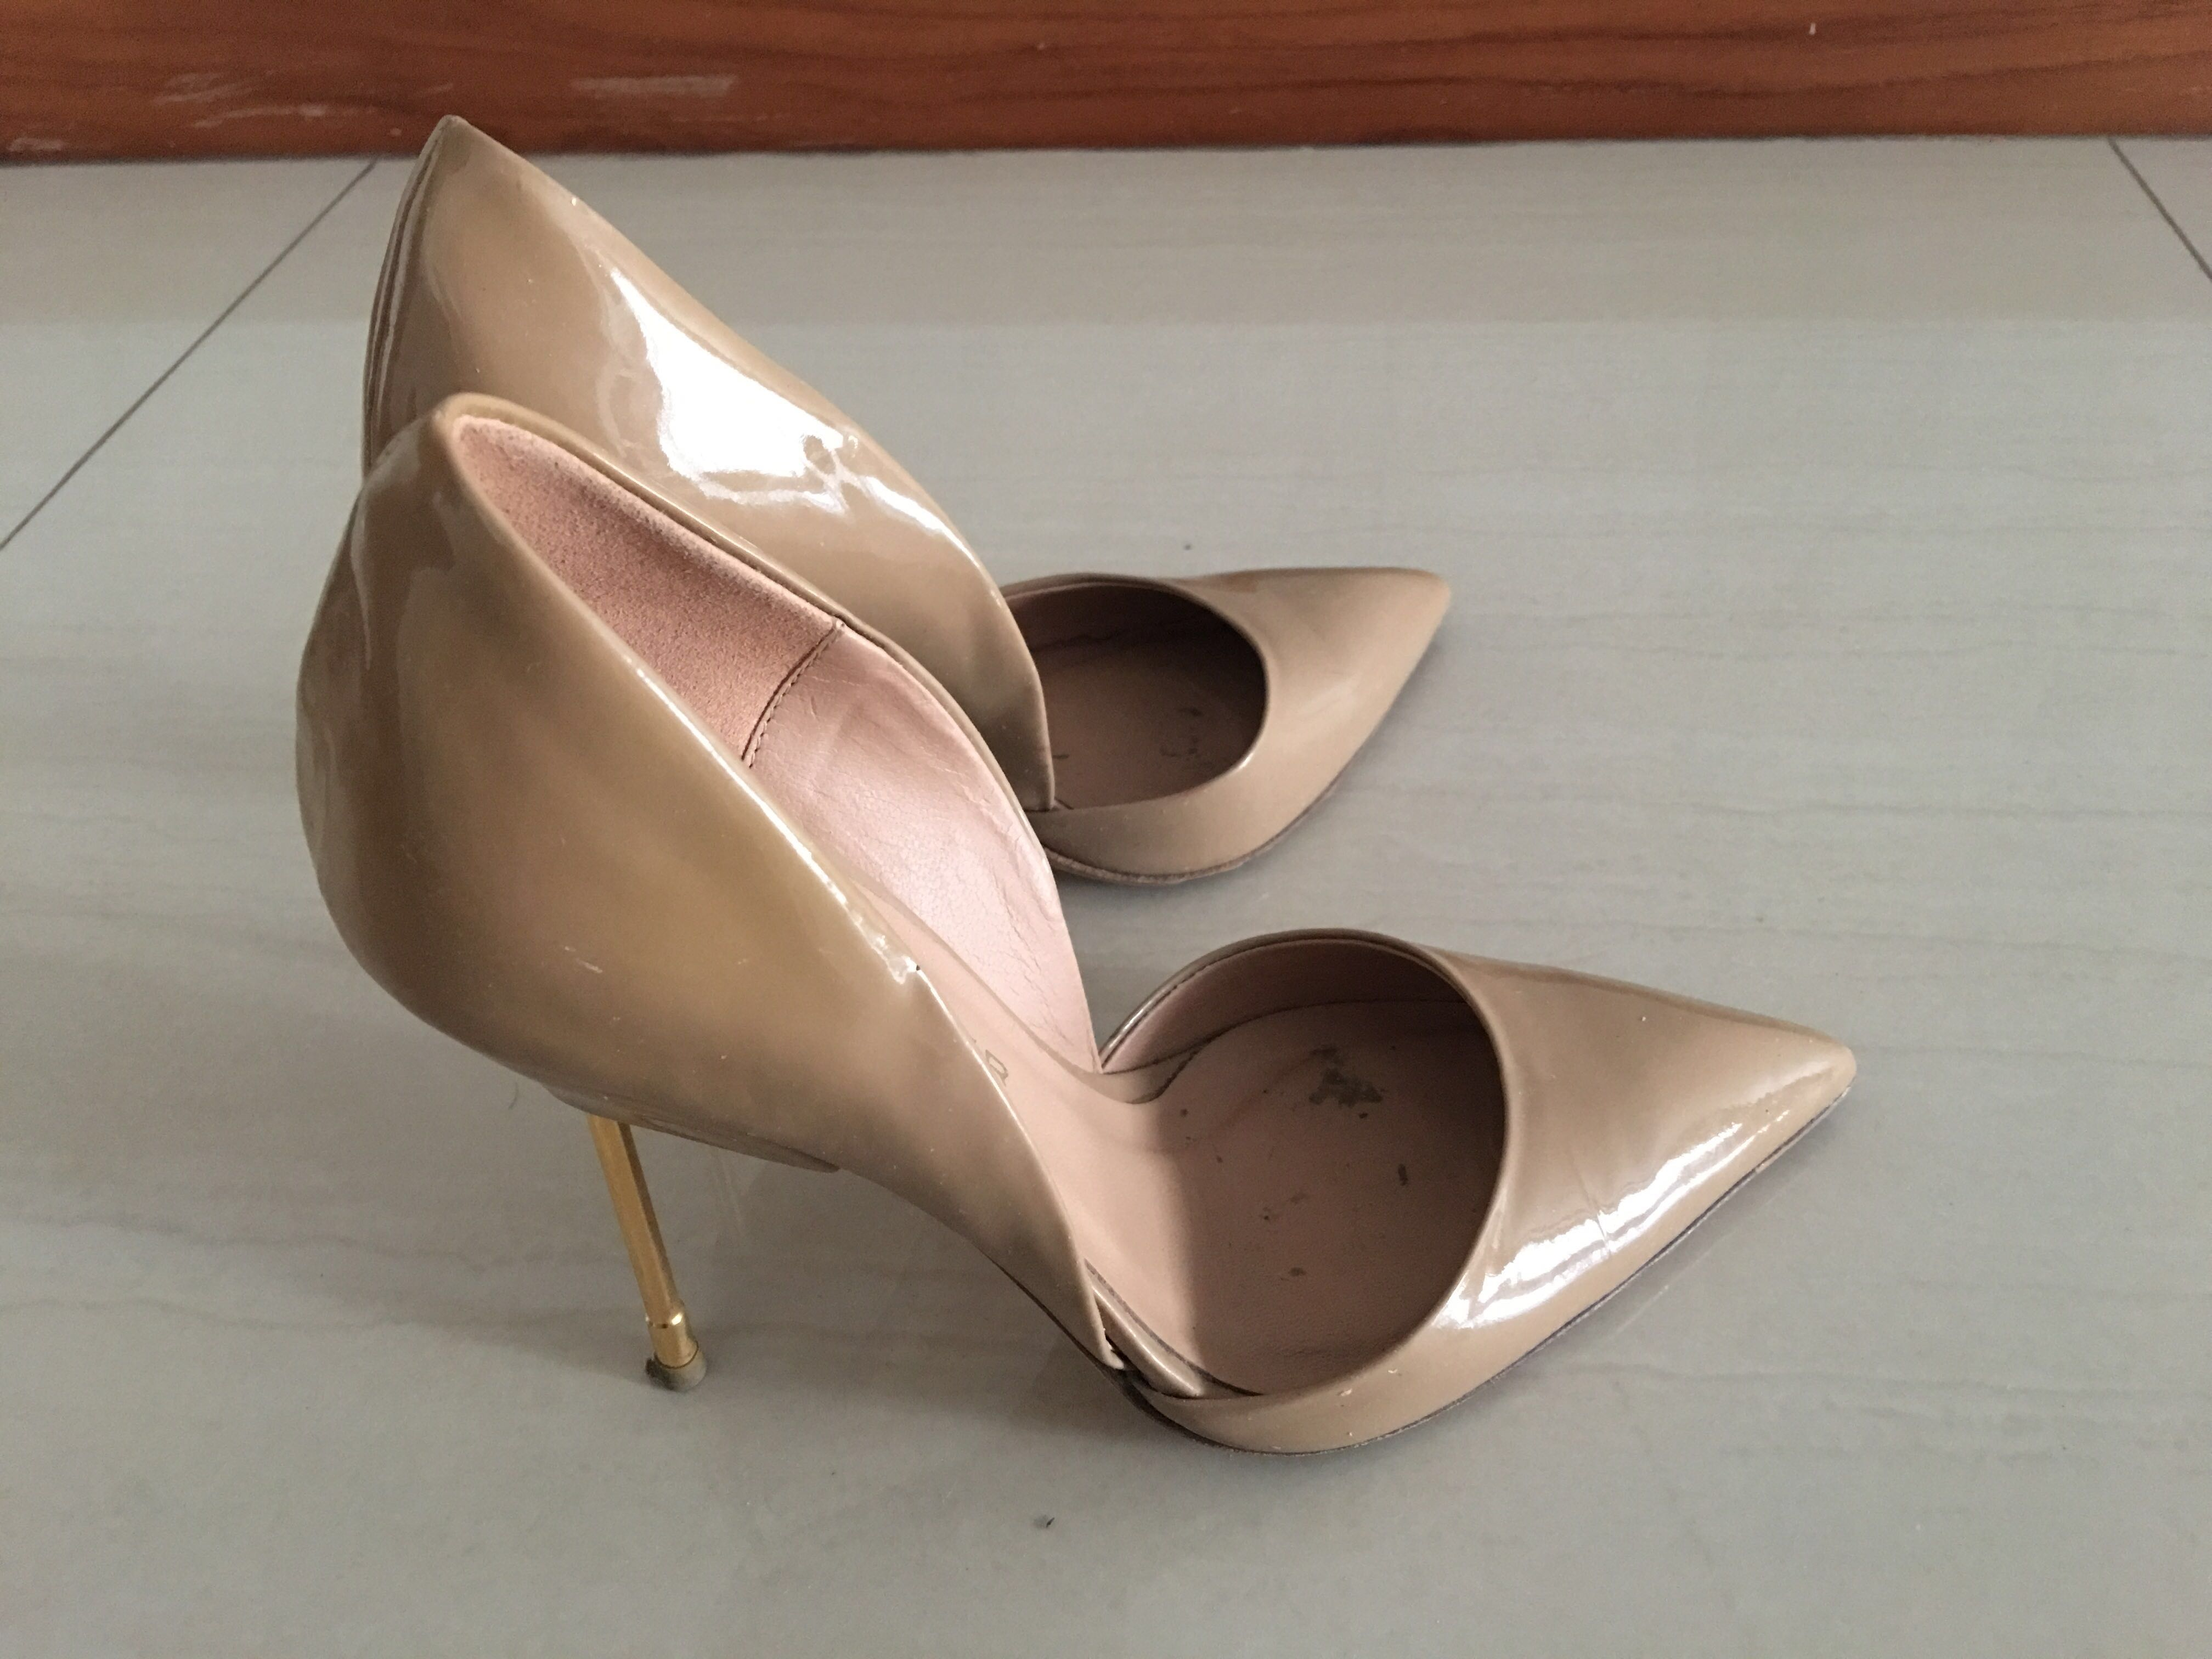 2eecbeaae95888 Home · Women s Fashion · Shoes · Heels. photo photo ...